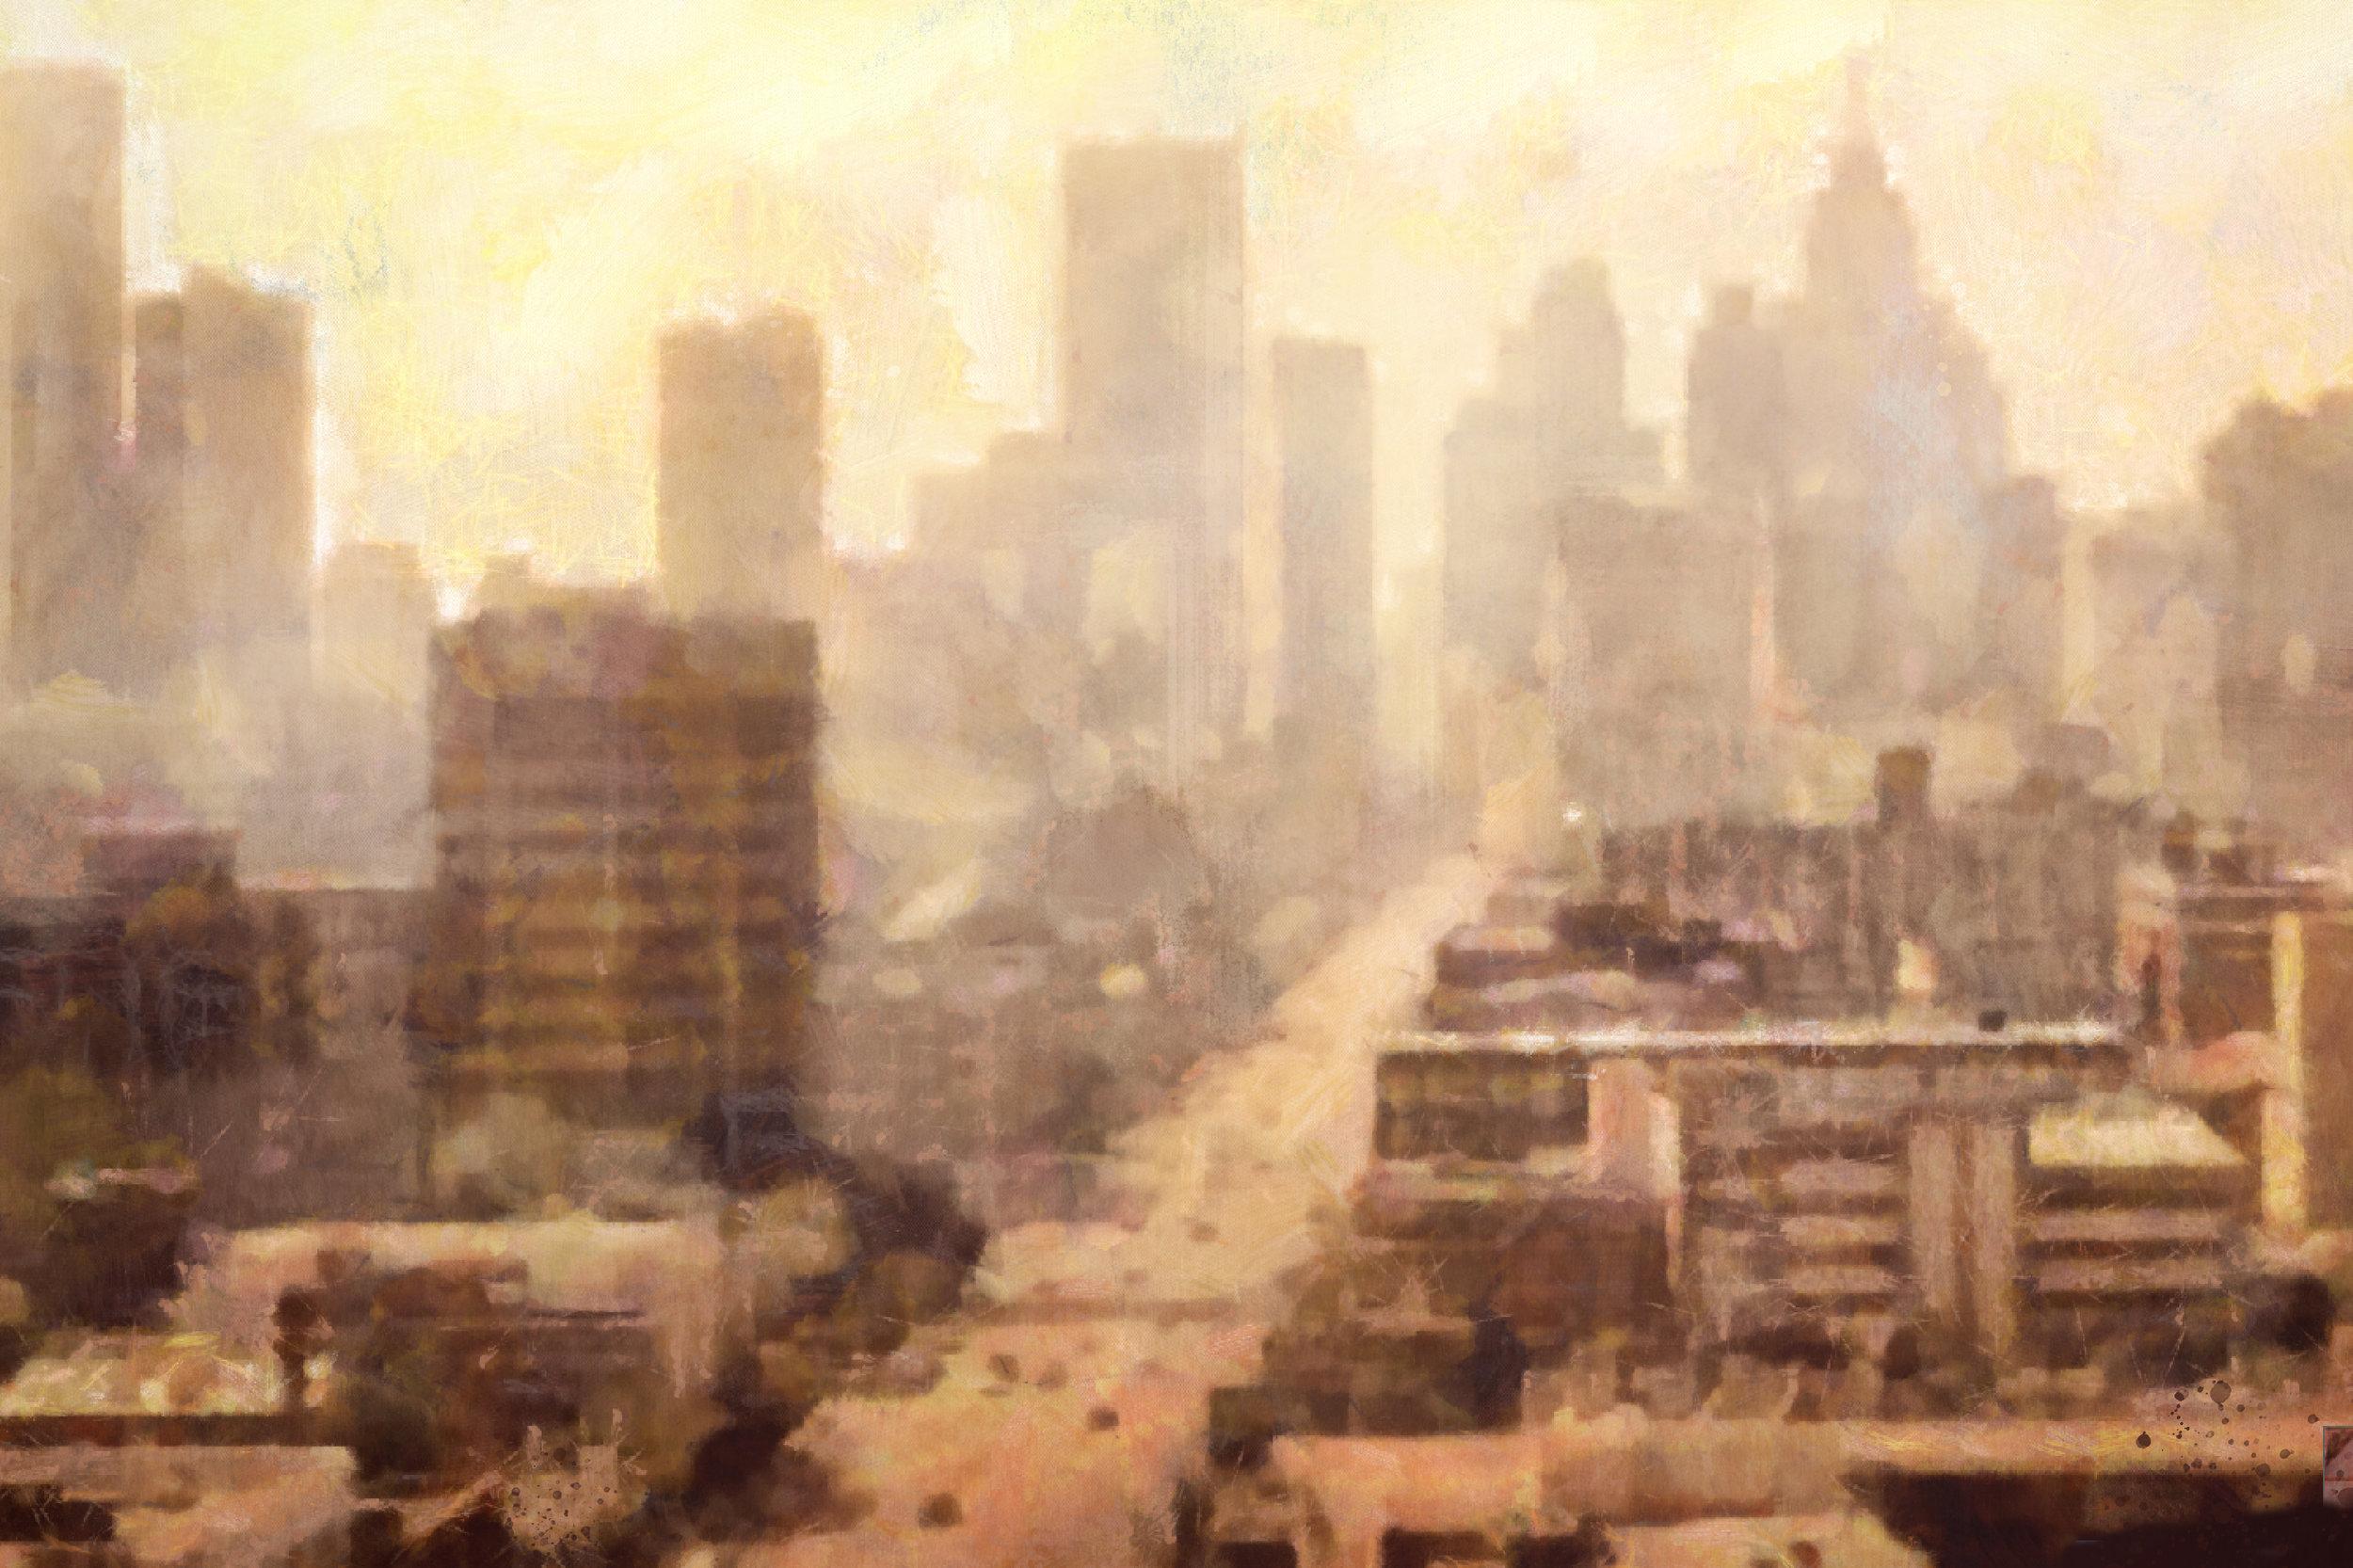 CityScape_DH.jpg